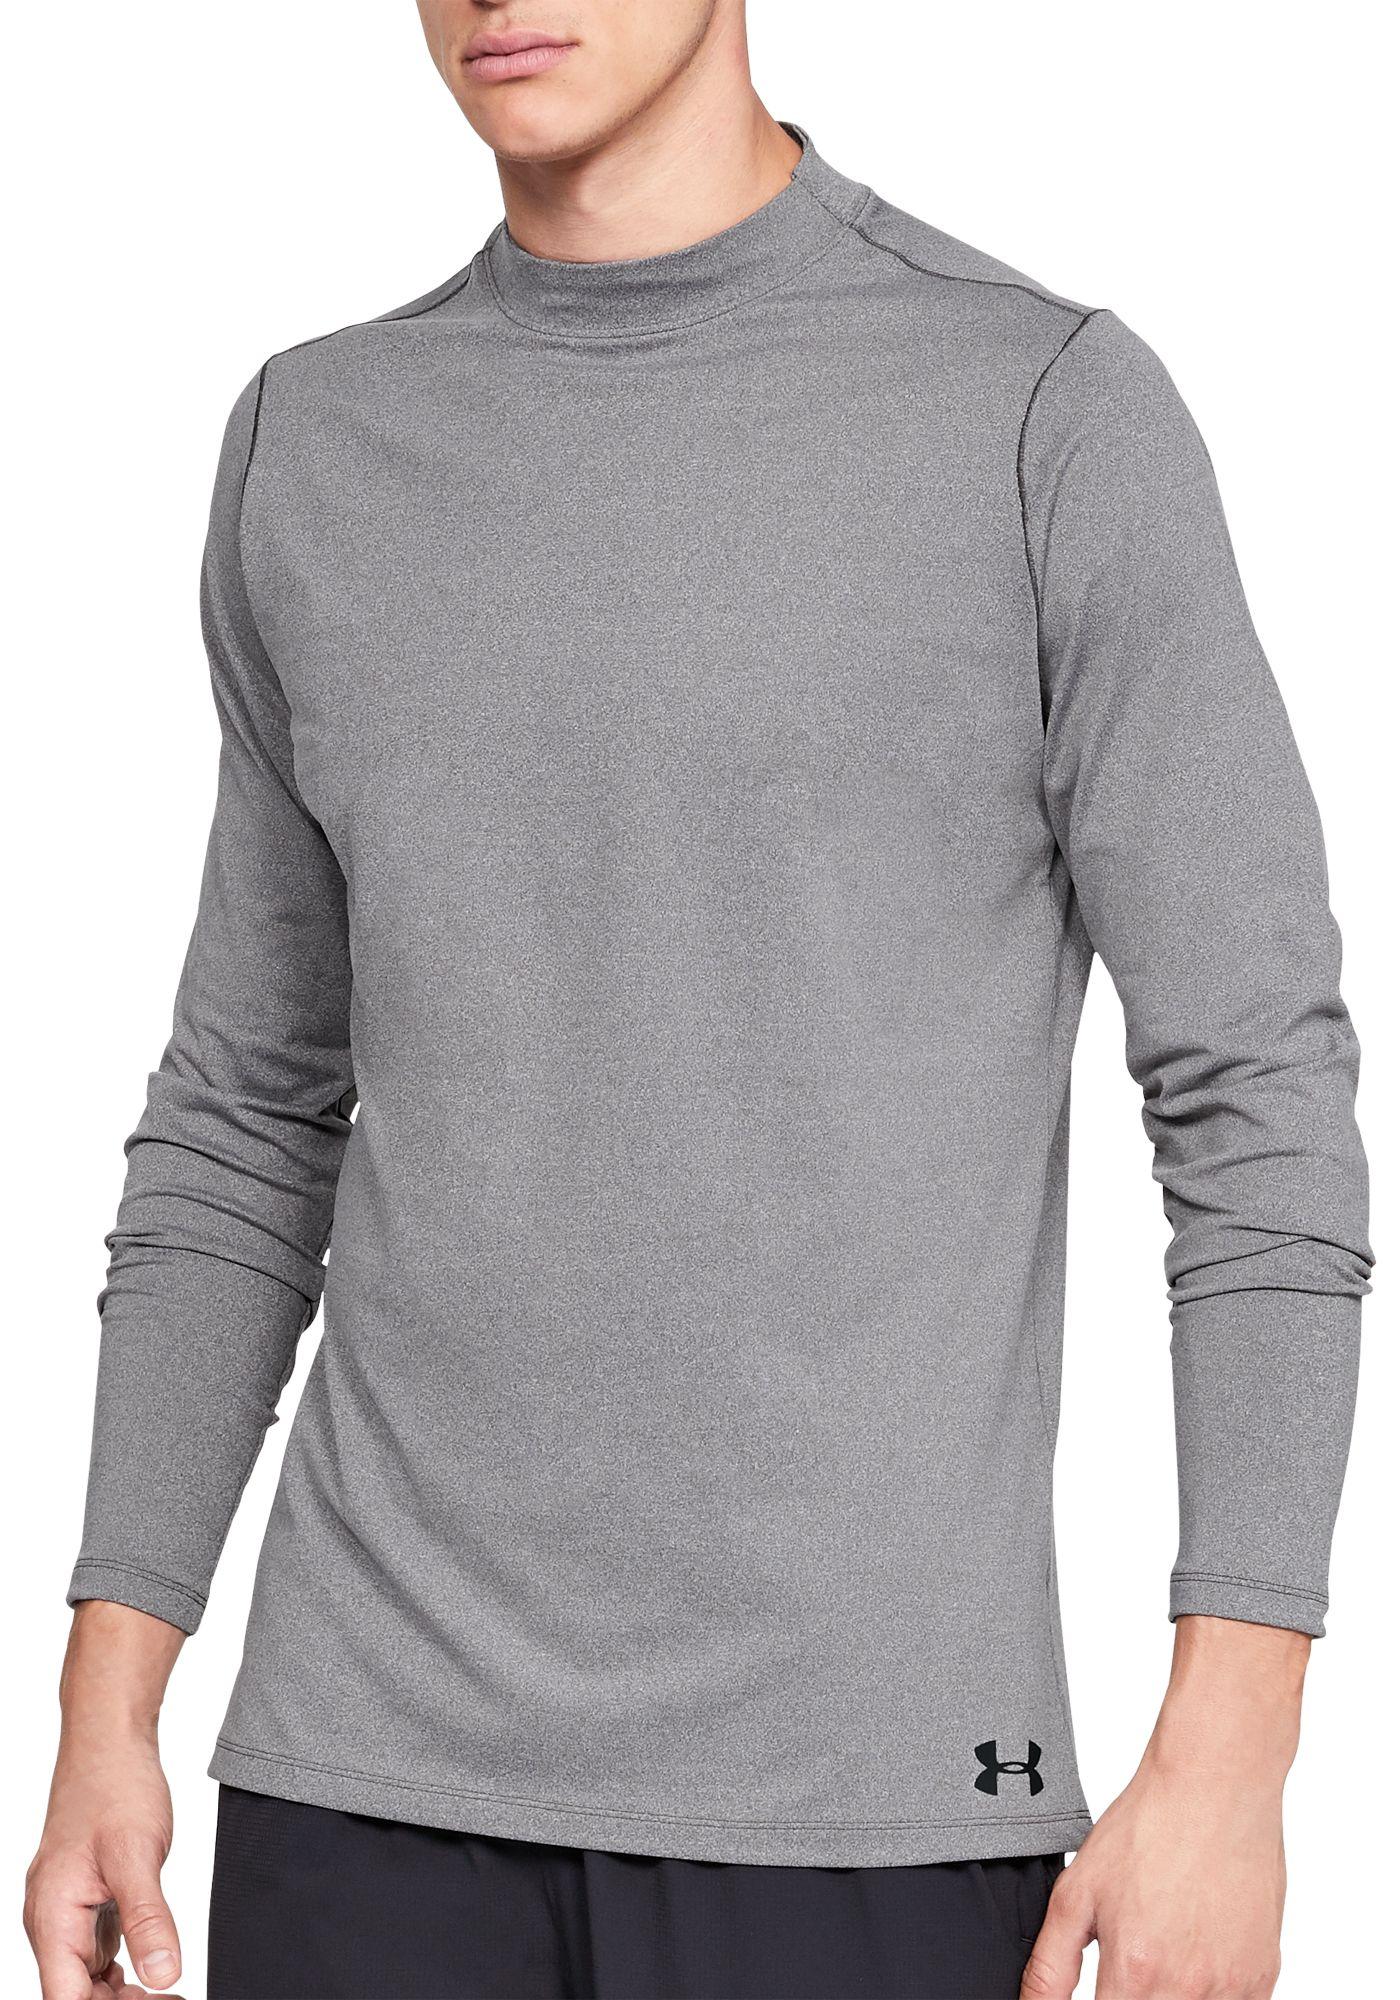 Under Armour Men's ColdGear Armour Mock Neck Long Sleeve Shirt